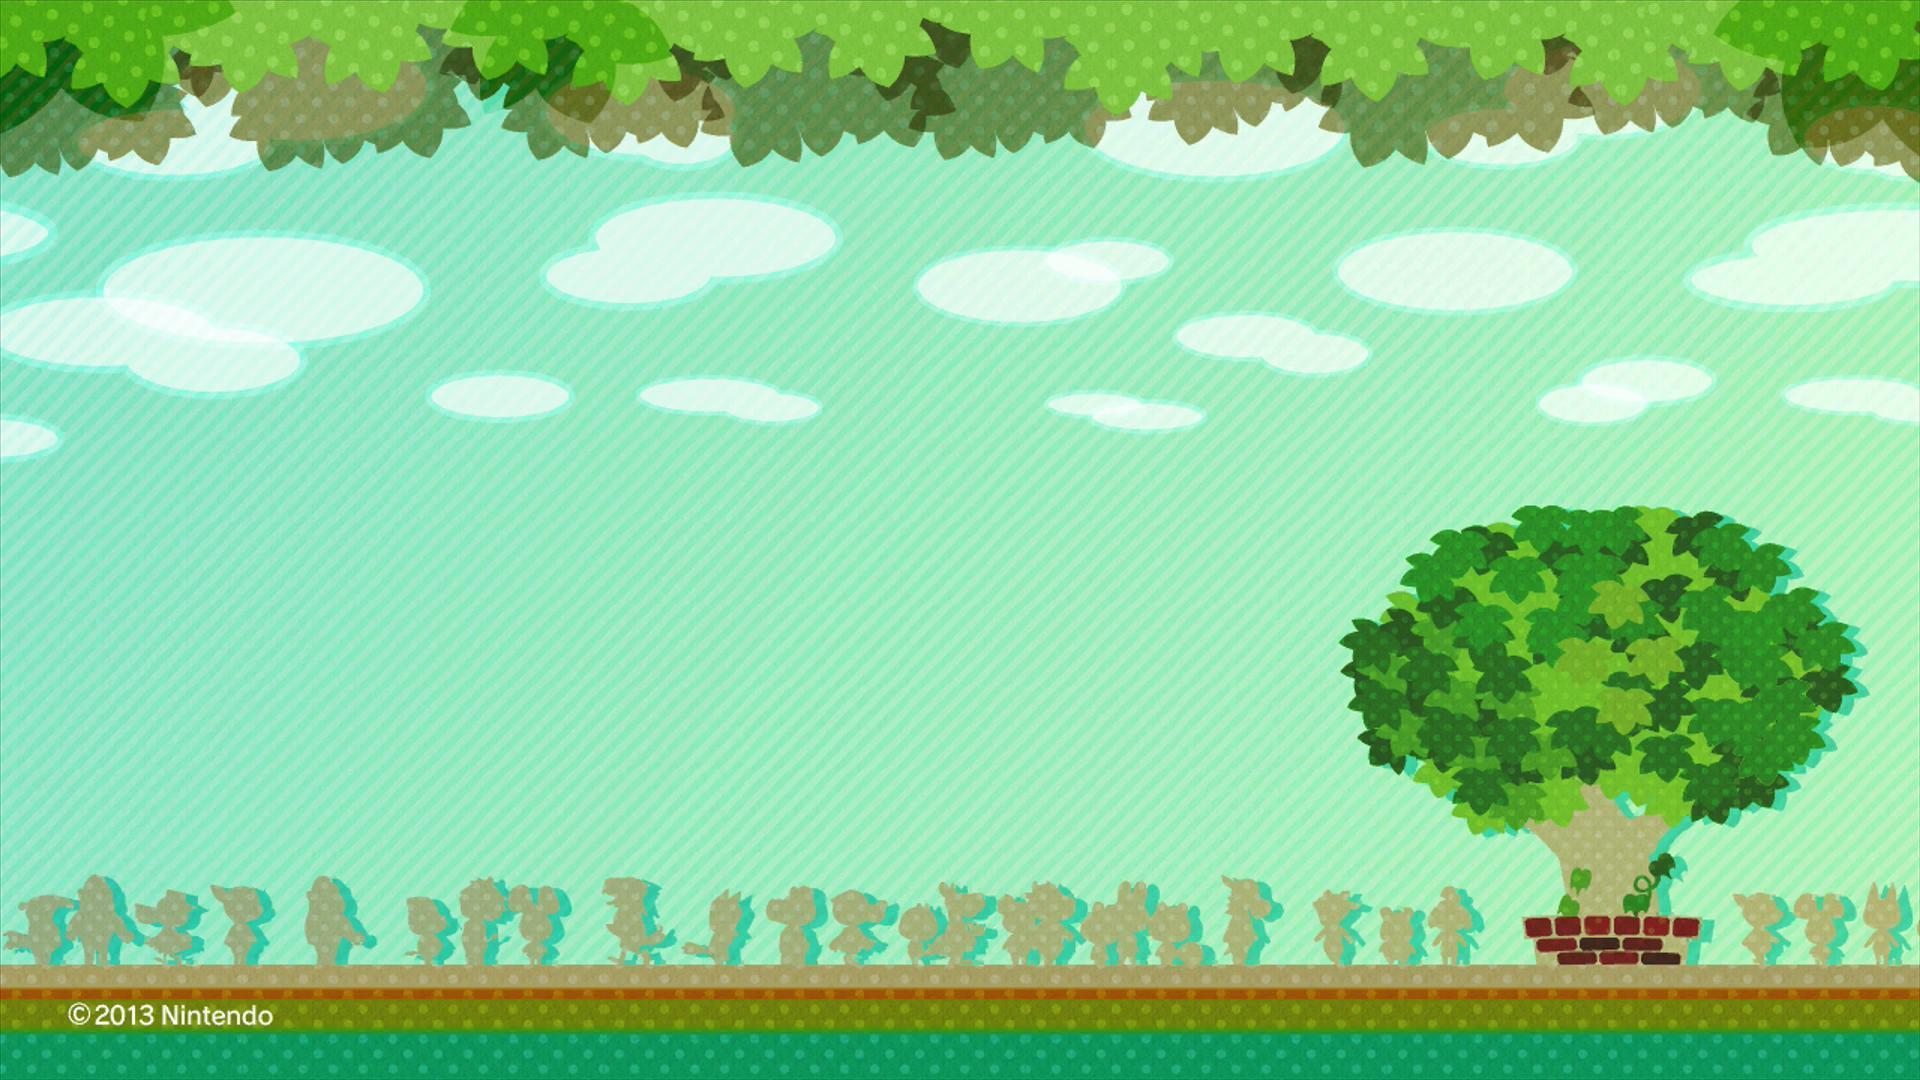 Animal Crossing Fall Wallpaper Nintendo Animal Crossing Series Wallpapers Wallpaper Cave